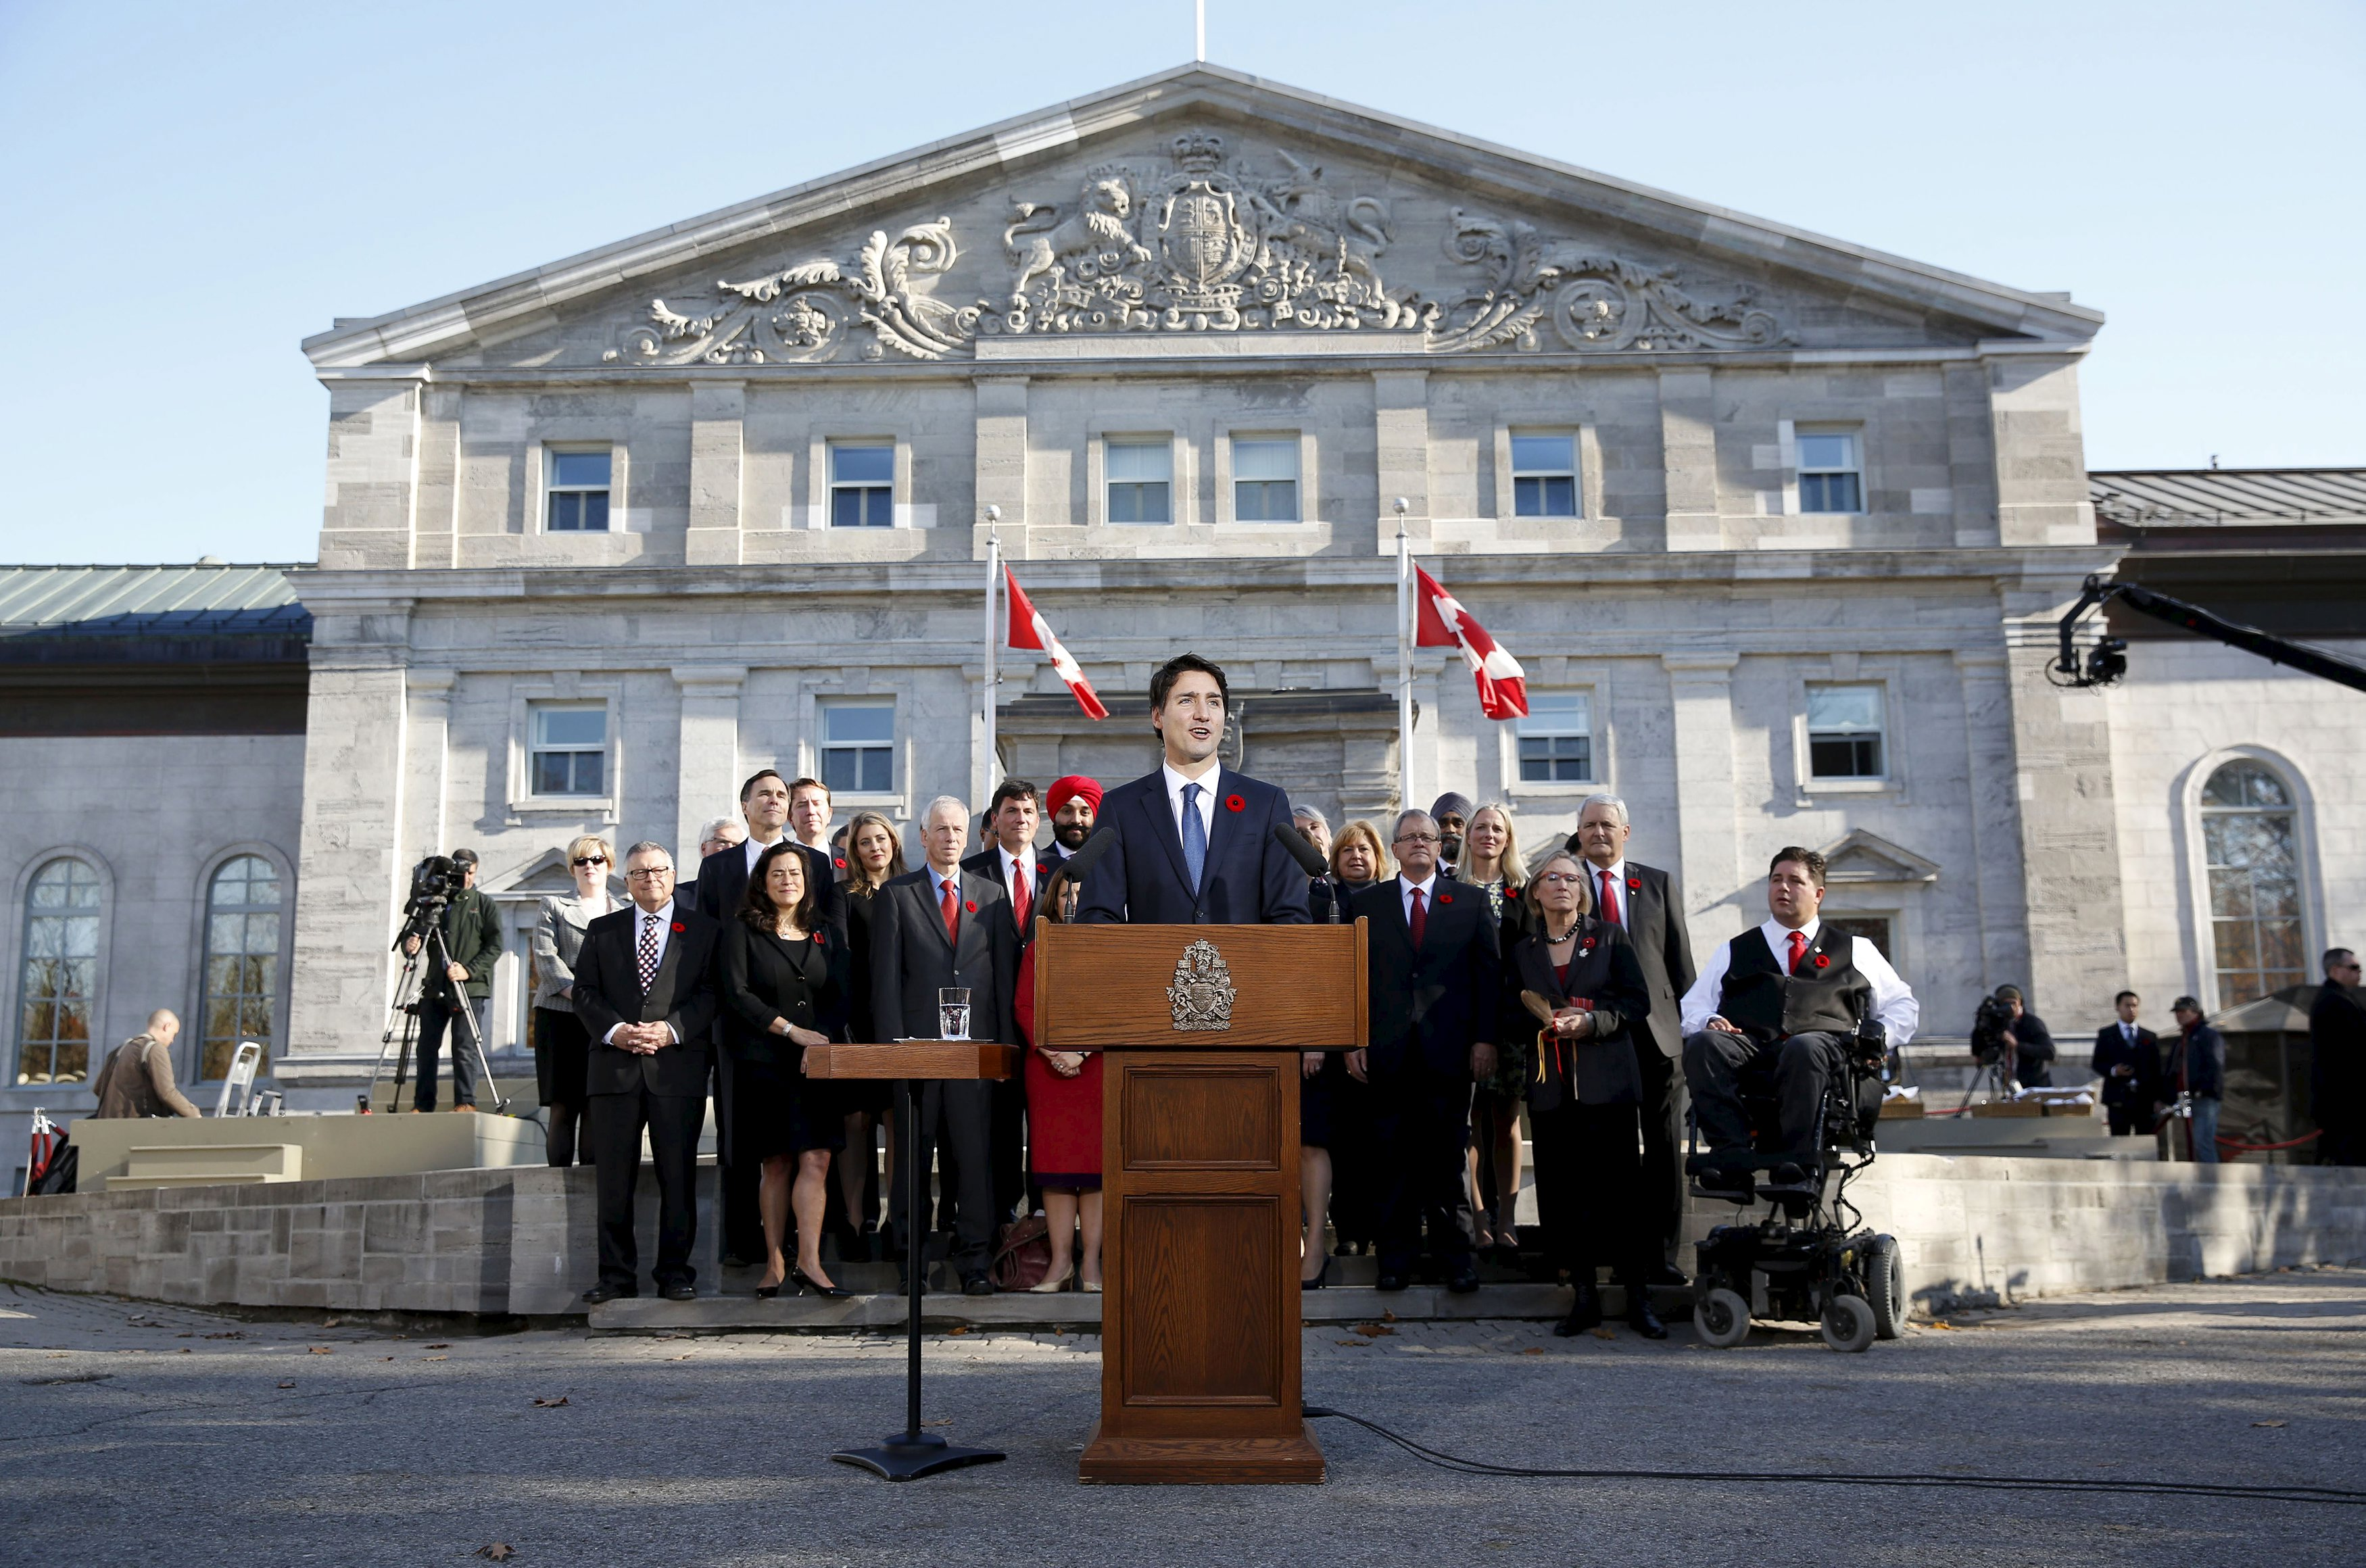 Perdana Menteri baru Kanada Justin Trudeau berbicara di depan keramaian di luar Rideau Hall setelah mengambil sumpah di upacara pelantikan di Ottawa, Rabu (4/11). Pemimpin Liberal Trudeau membentuk Kabinet muda dari beragam etnis dan kesetaraaan gender pada hari Rabu saat ia dilantik sebagai Perdana Menteri Kanada ke-23, menandai berakhirnya era Konservatif yang berlangsung hampir satu dekade. Trudeau, 43 tahun, memulai pemerintahannya dengan beberapa kontroversi dengan keputusannya untuk memilih jumlah yang sama antara pria dan wanita untuk merampingkan kabinet, pertama kalinya perbandingan gender tercapai di tim kementerian Kanada. REUTERS/Blair Gable.